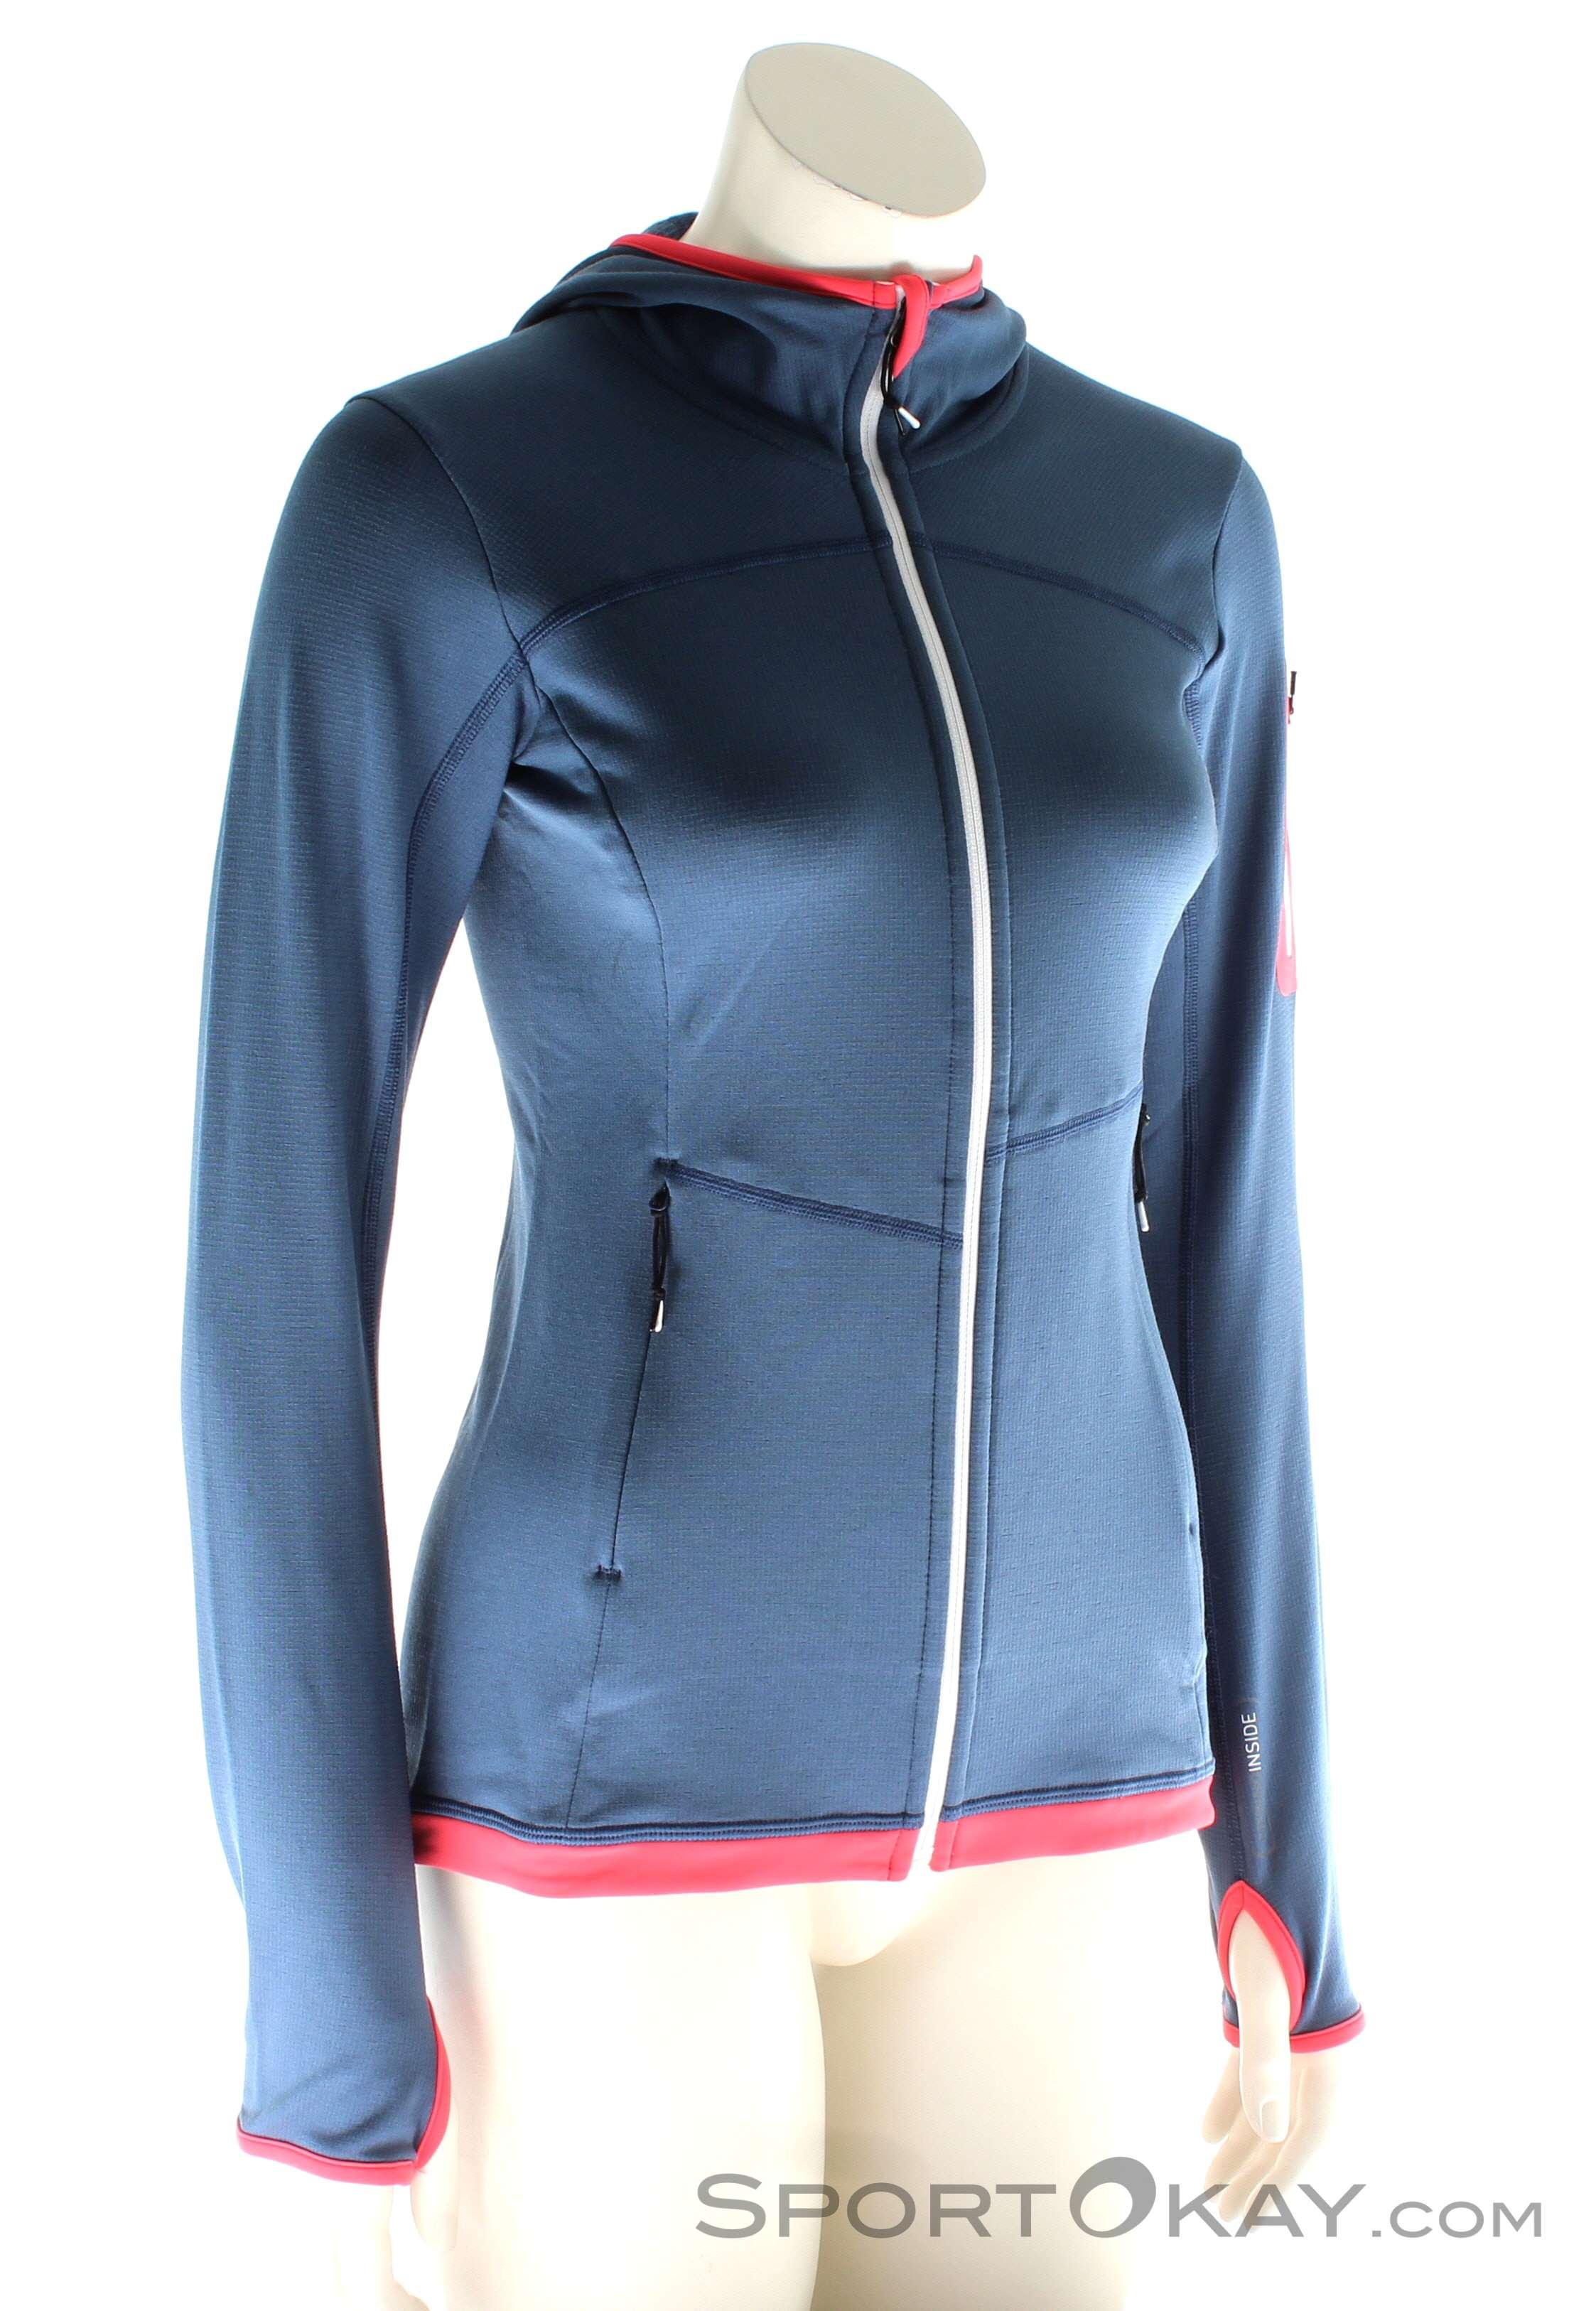 Ortovox Fleece Light Hoody Damen Tourensweater, Ortovox, Blau, , Damen, 0016-10578, 5637562039, 4250875282995, N1-01.jpg